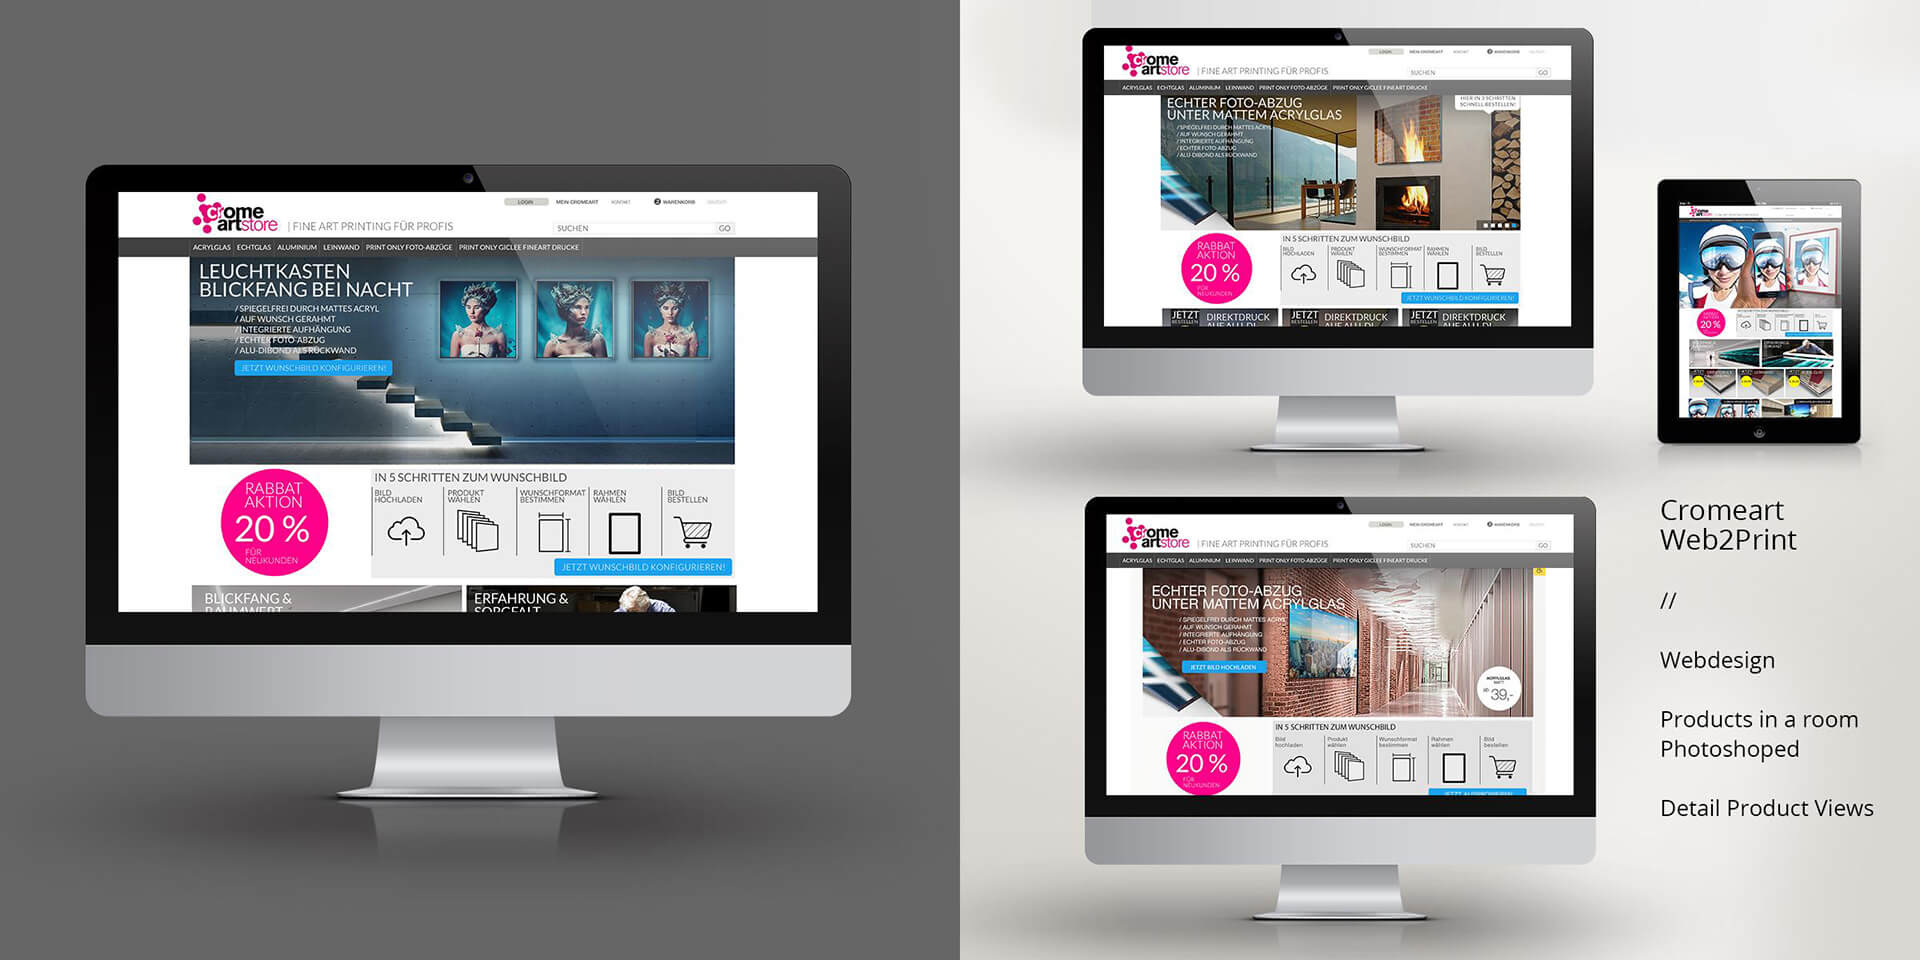 webtoprint webdesign variable graphics variable graphics online marketing product design photo 15